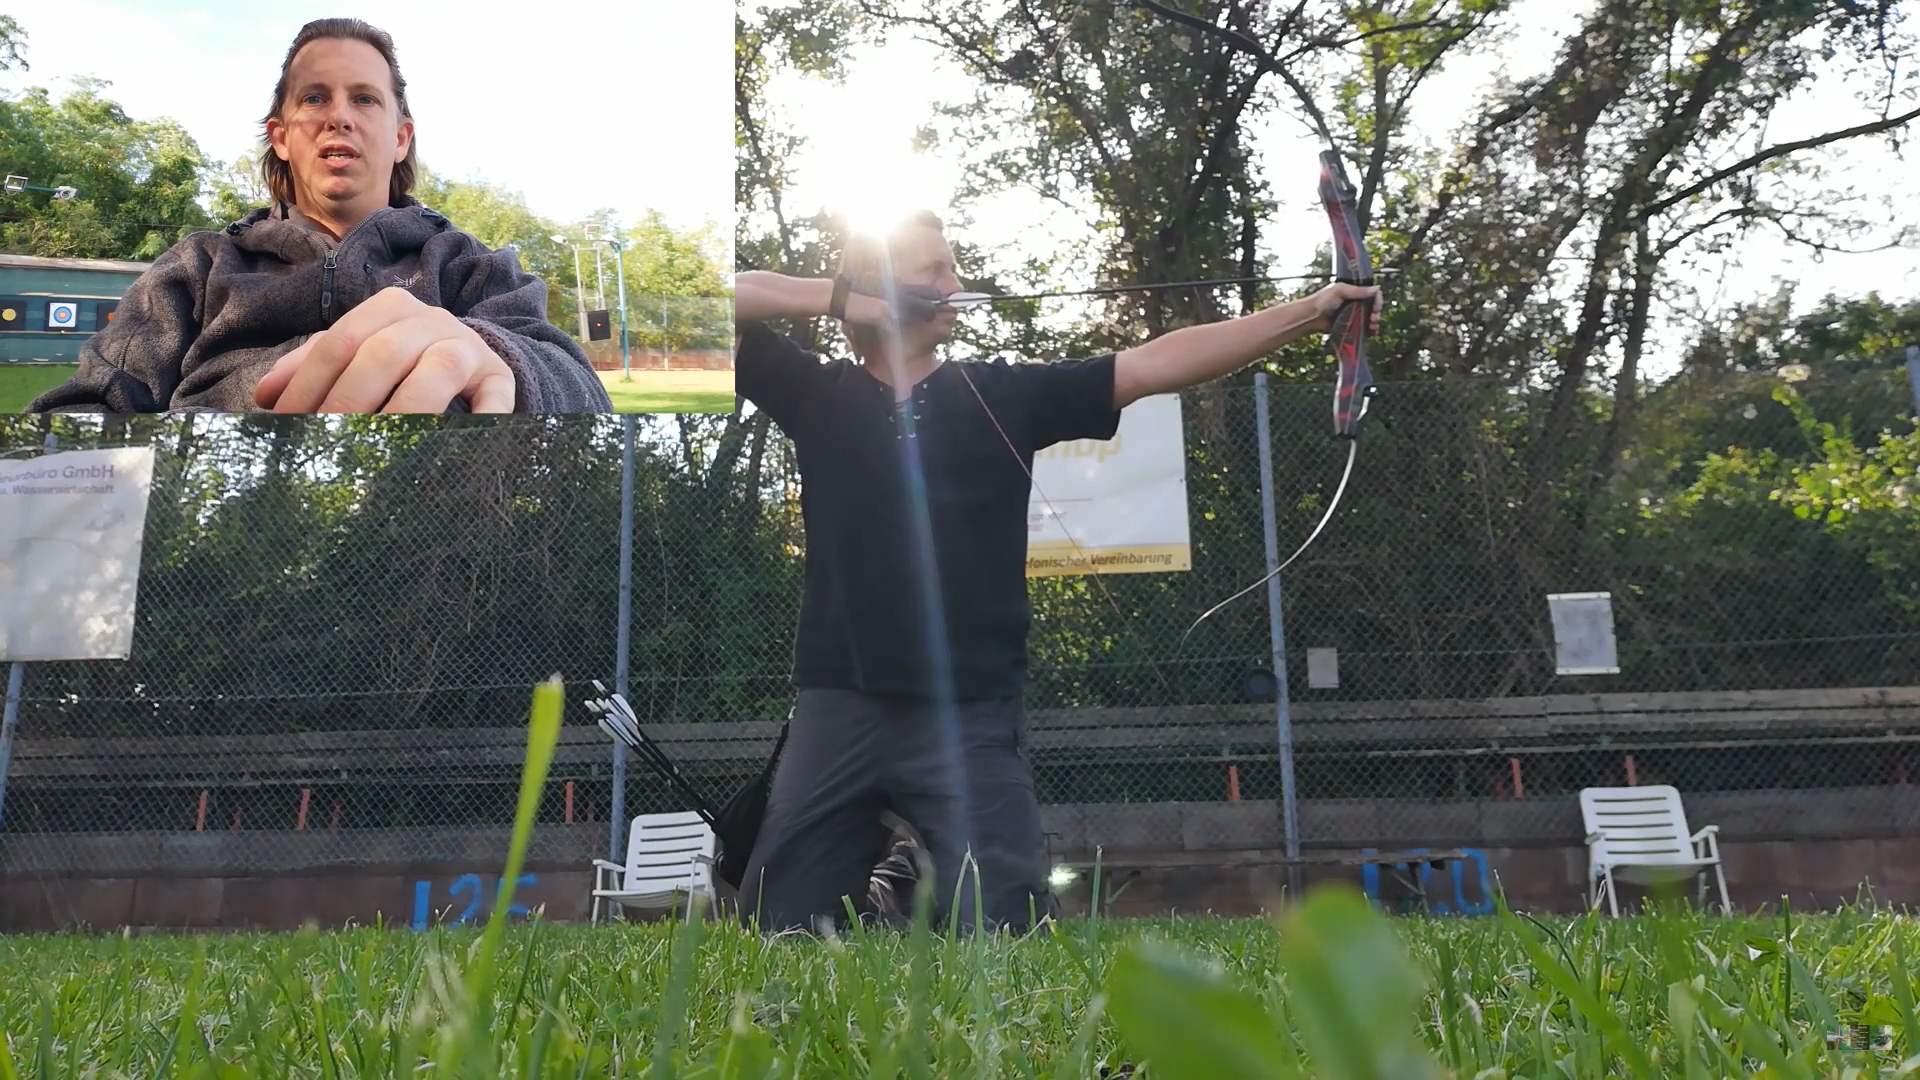 alternative Körperhaltung Bogenschießen